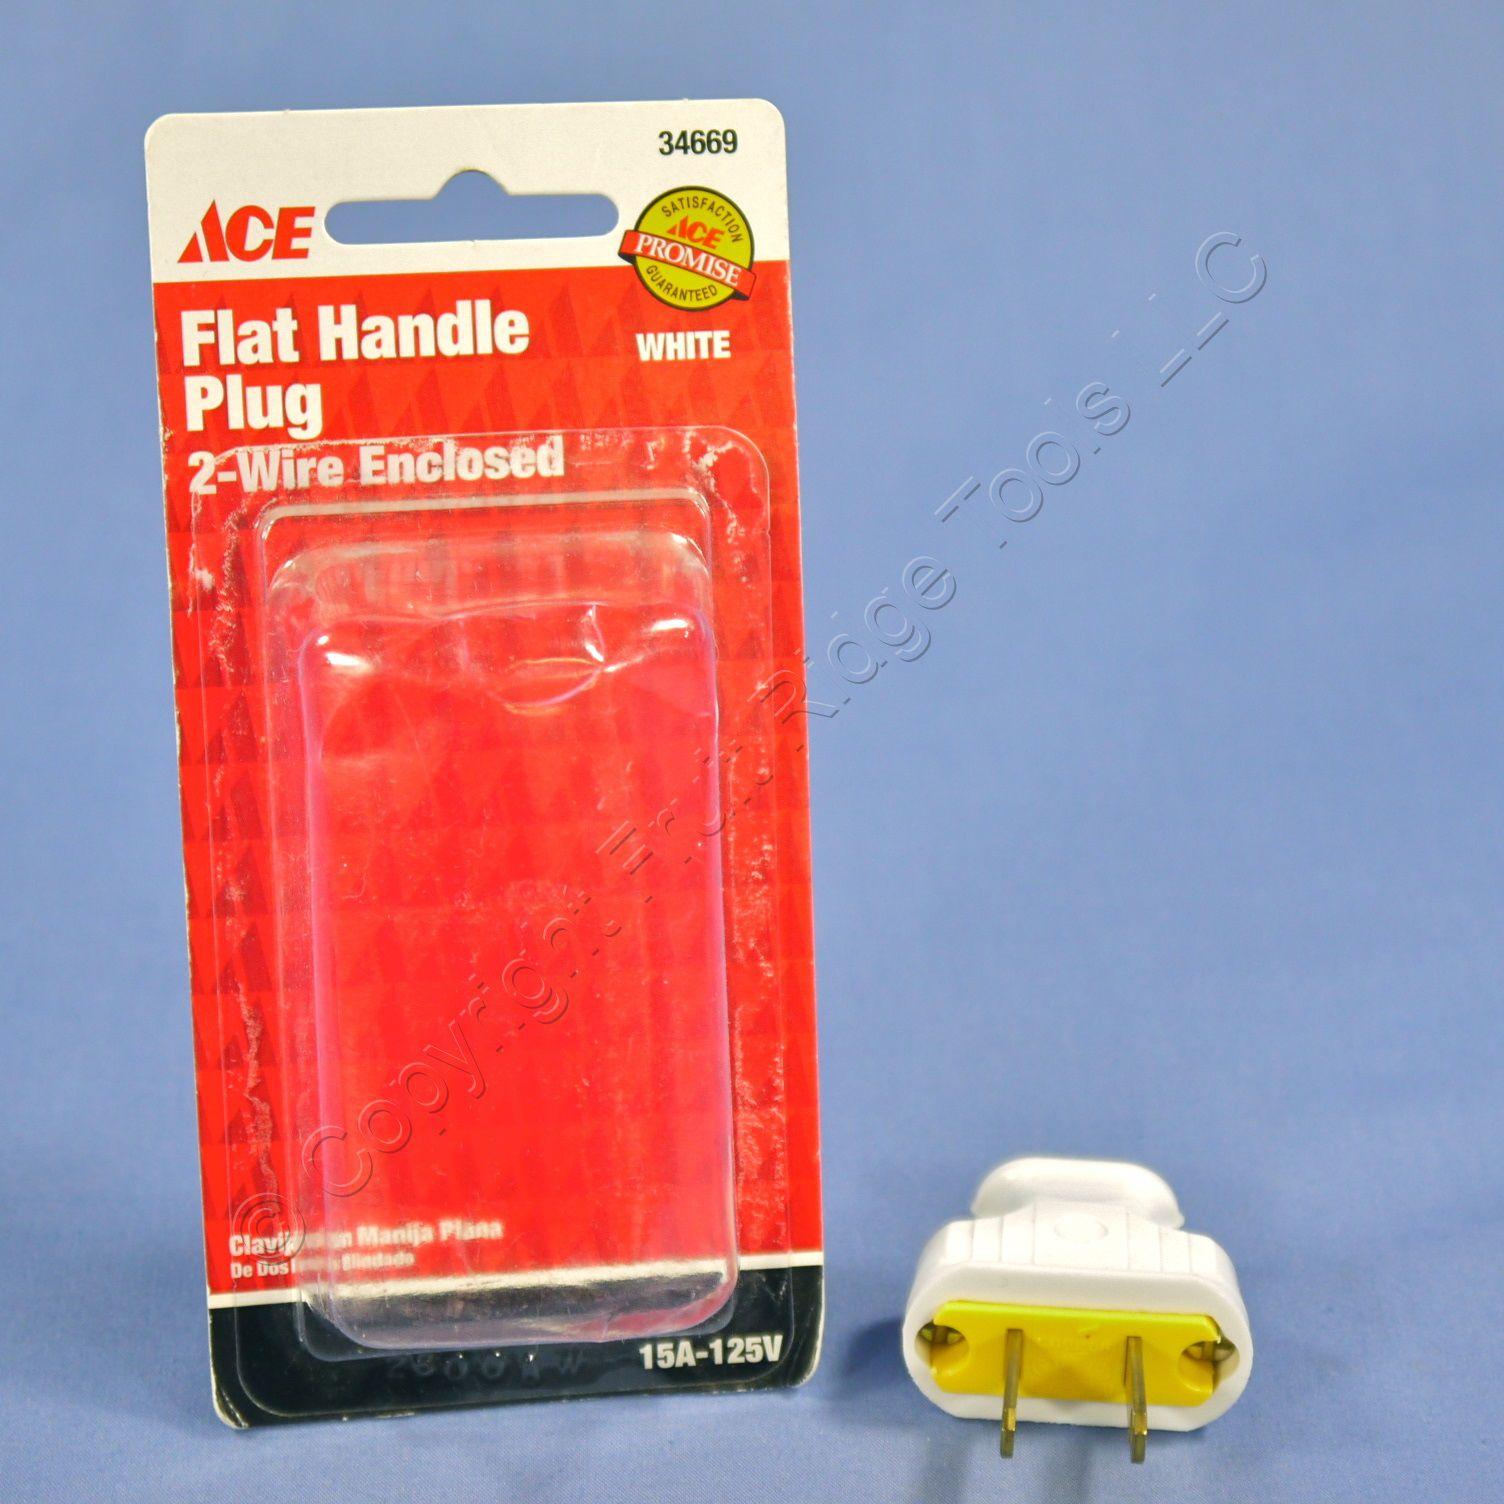 Ace Residential White EZ Grip Flat Plugs NEMA 1-15P 1-15 15A 125V 34669-W